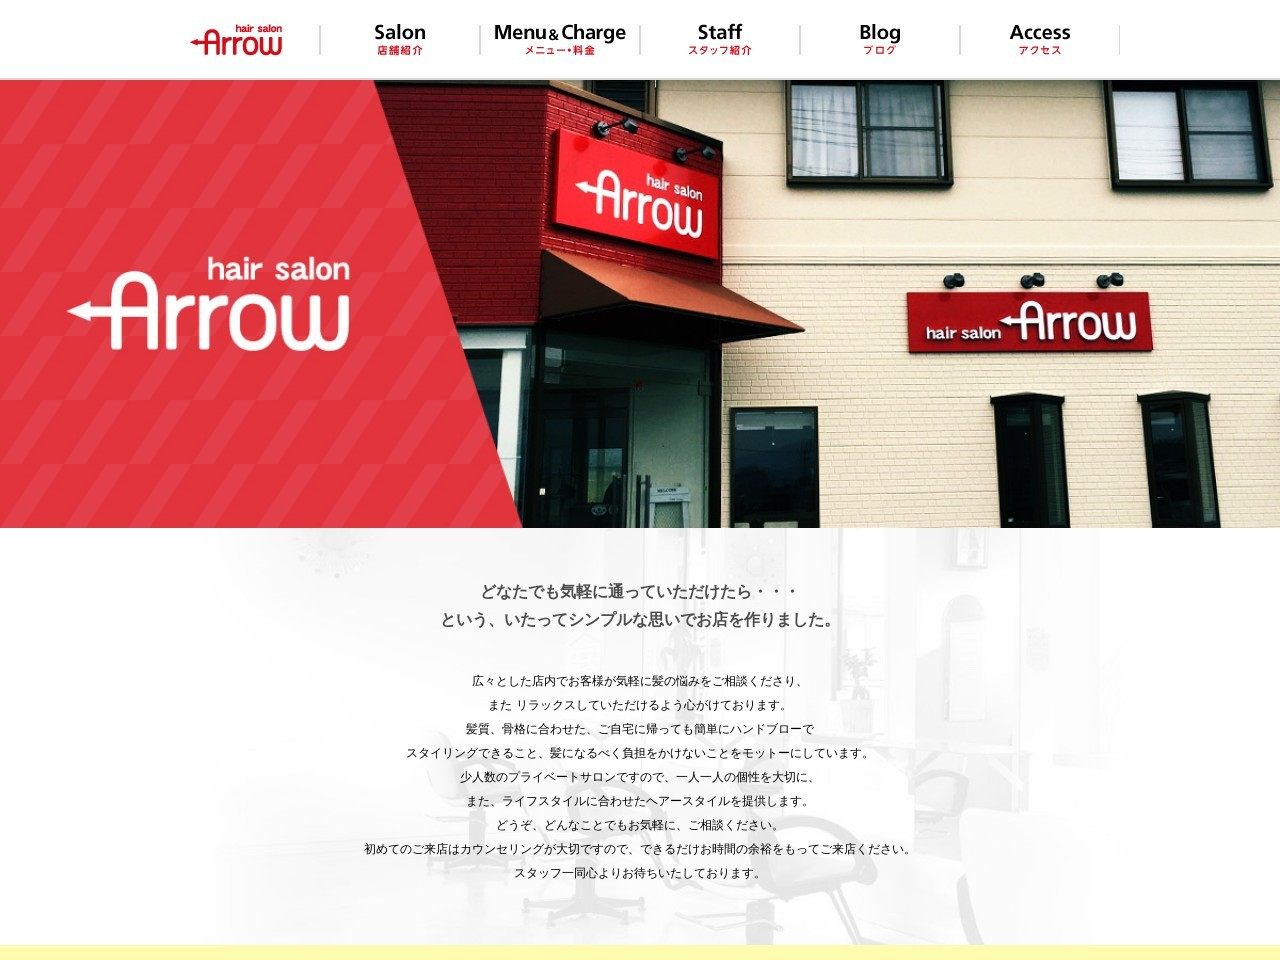 Arrow(アロー)